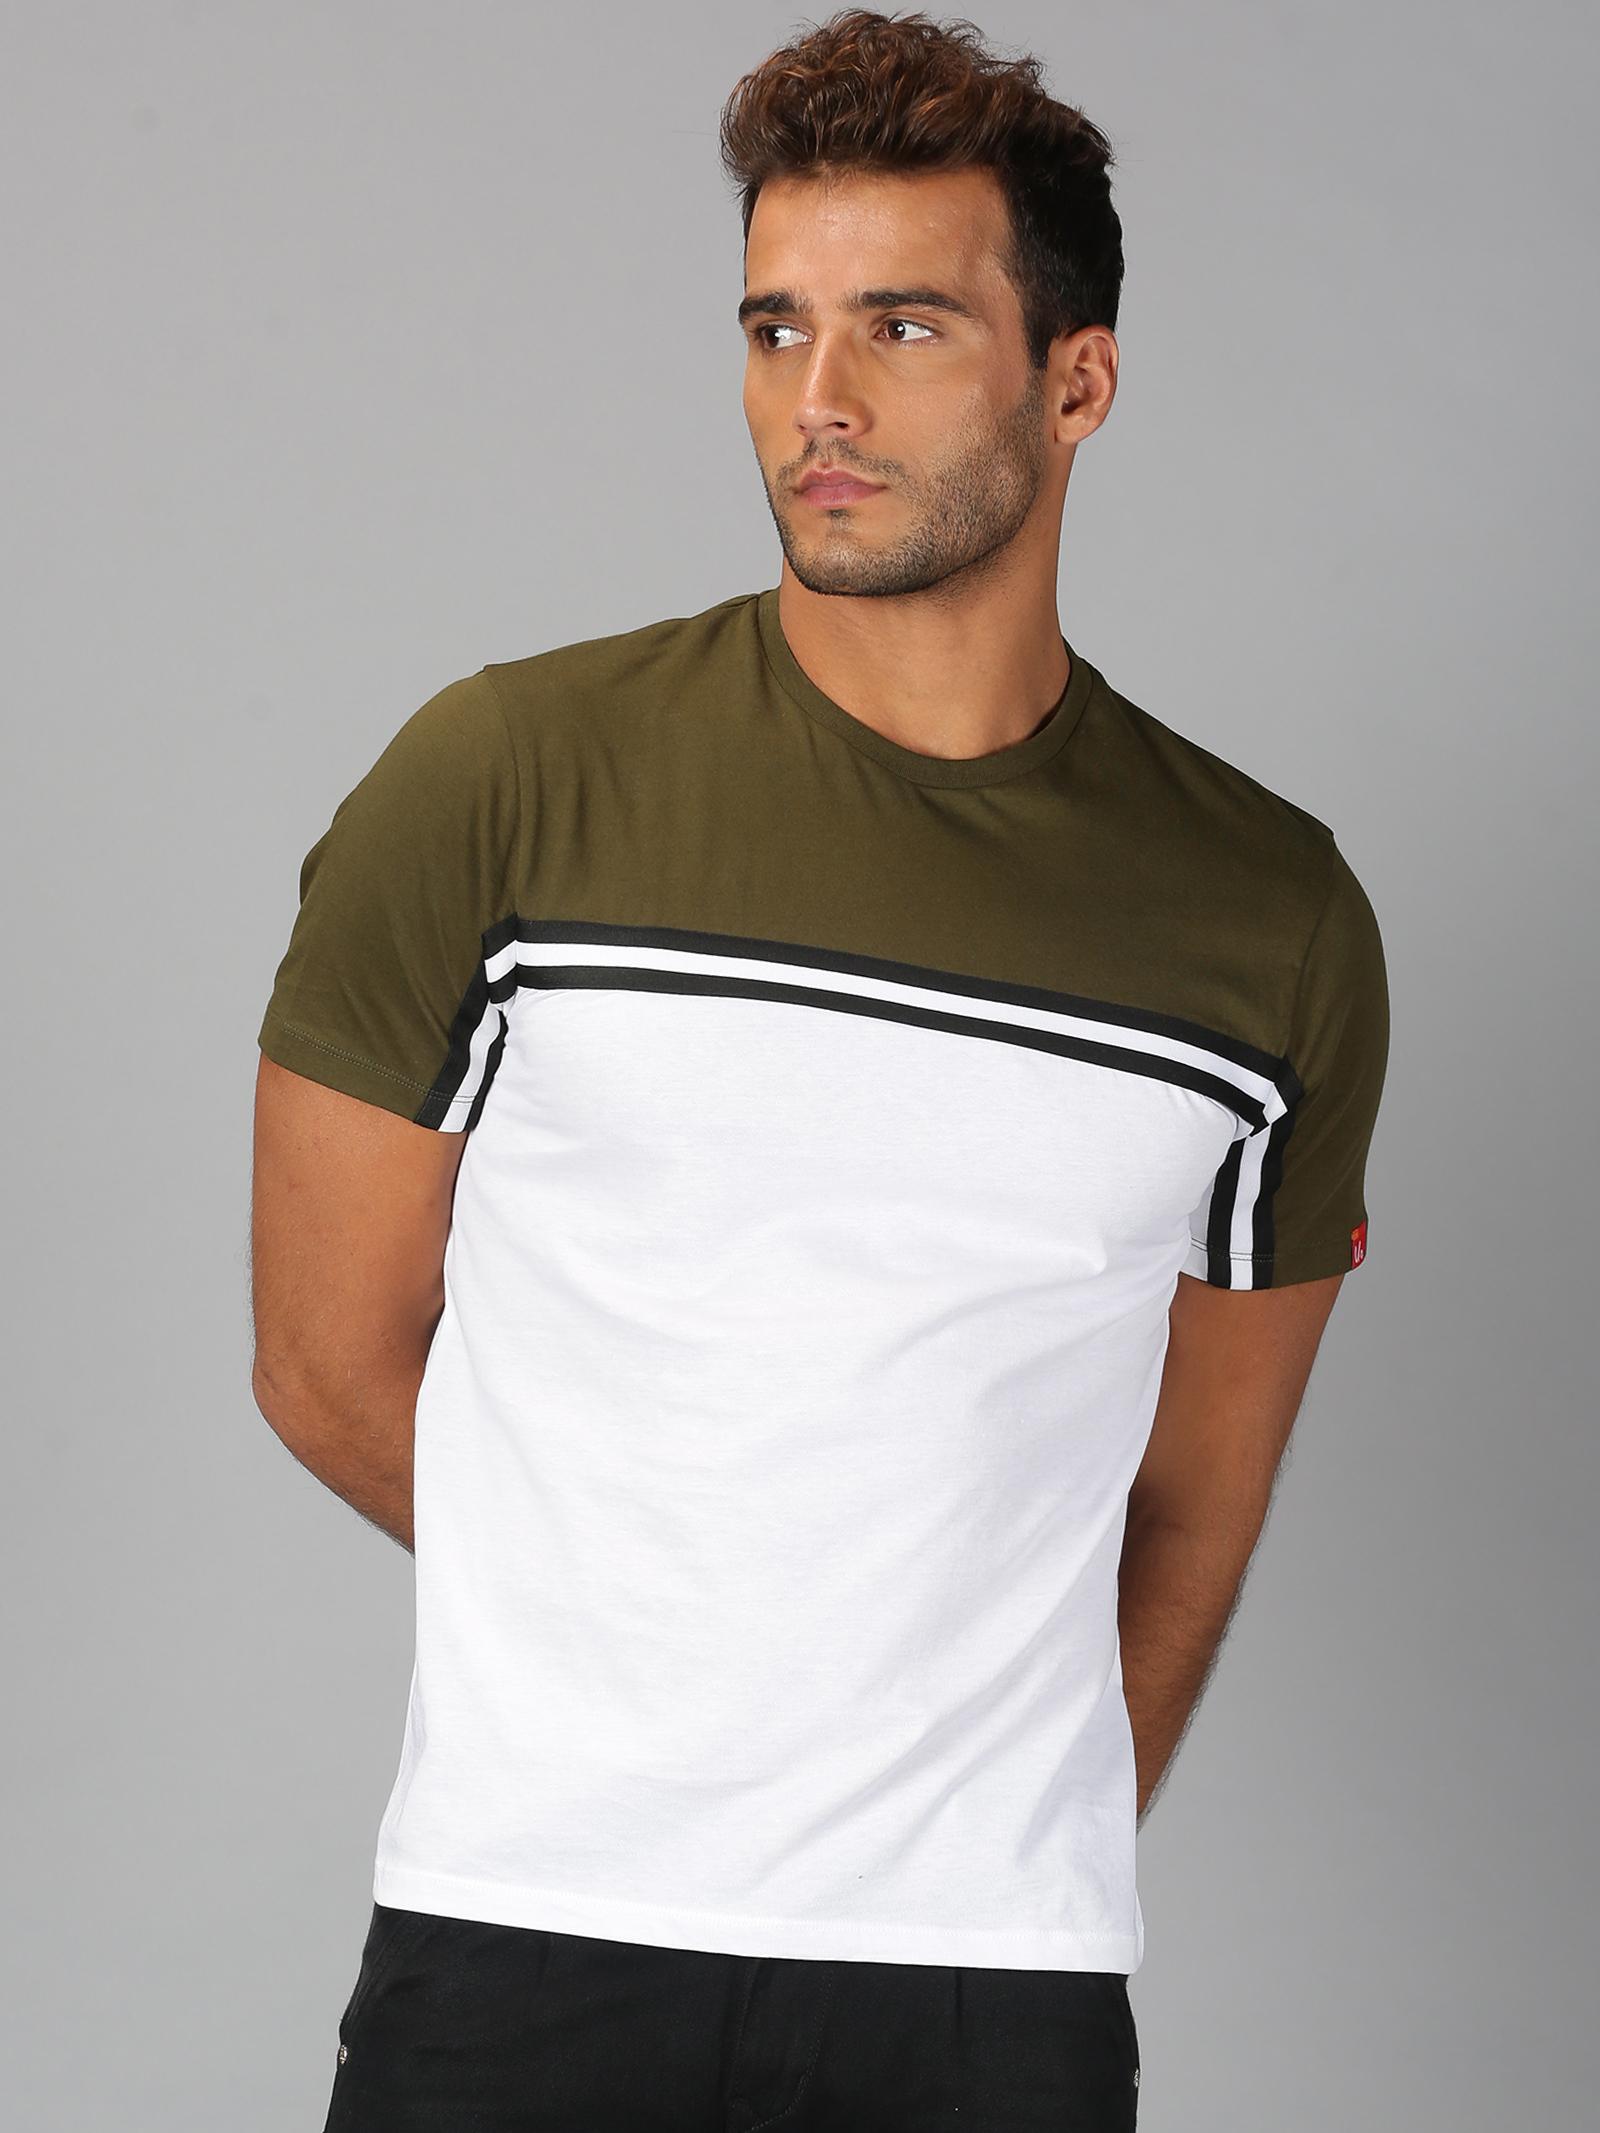 UrGear | Mens Round Neck Colourblock White & Green T-Shirt